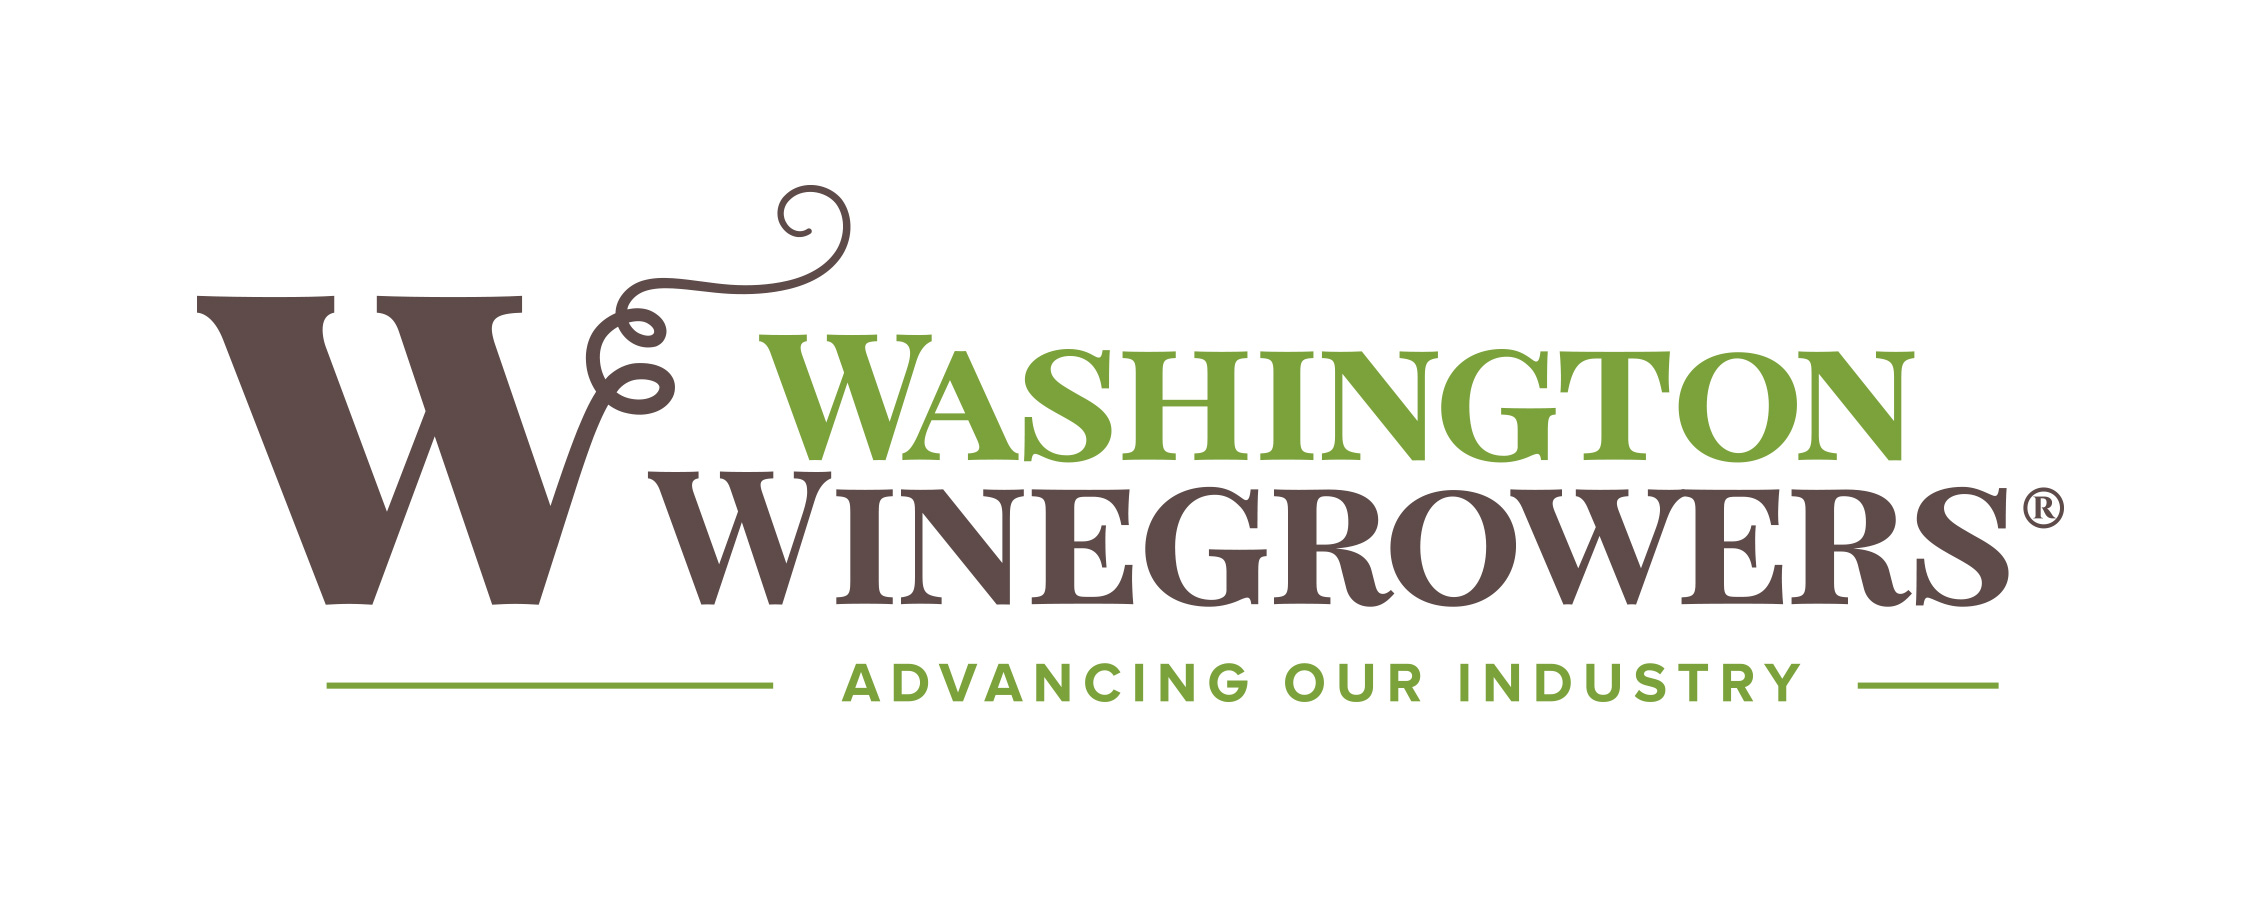 Washington-Winegrowers-Logo-Horizontal.jpg